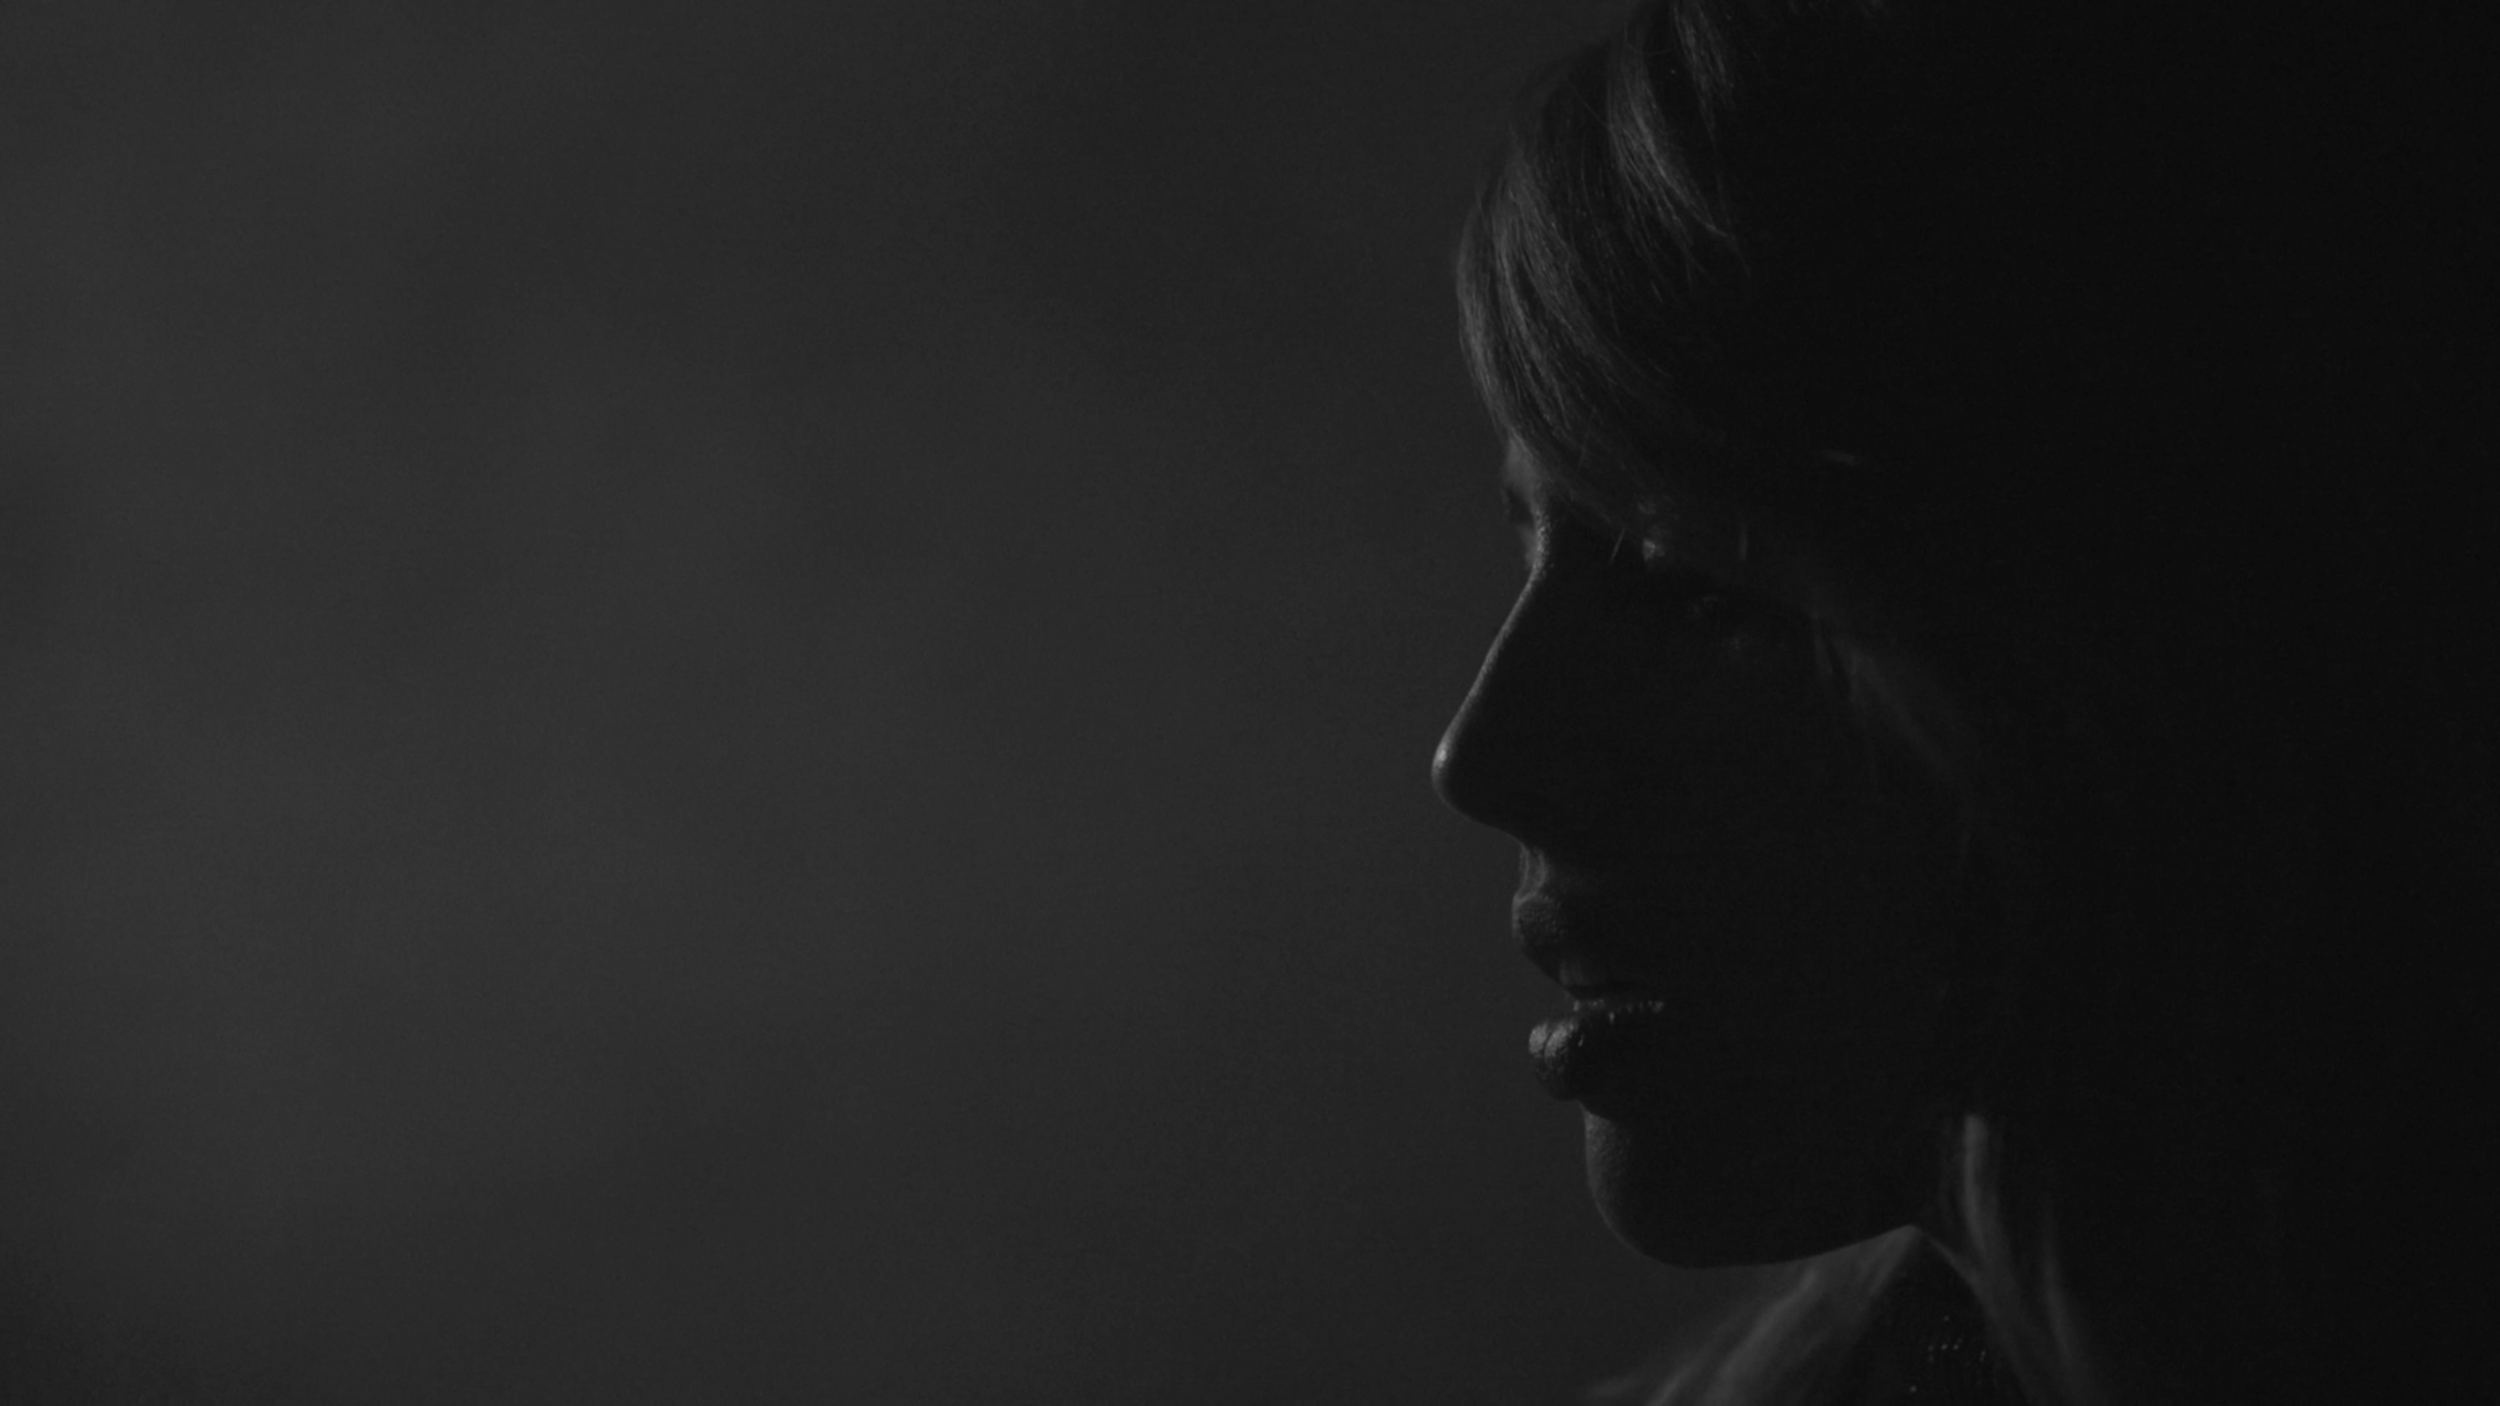 LucyMason-VasiliGavre-11.png